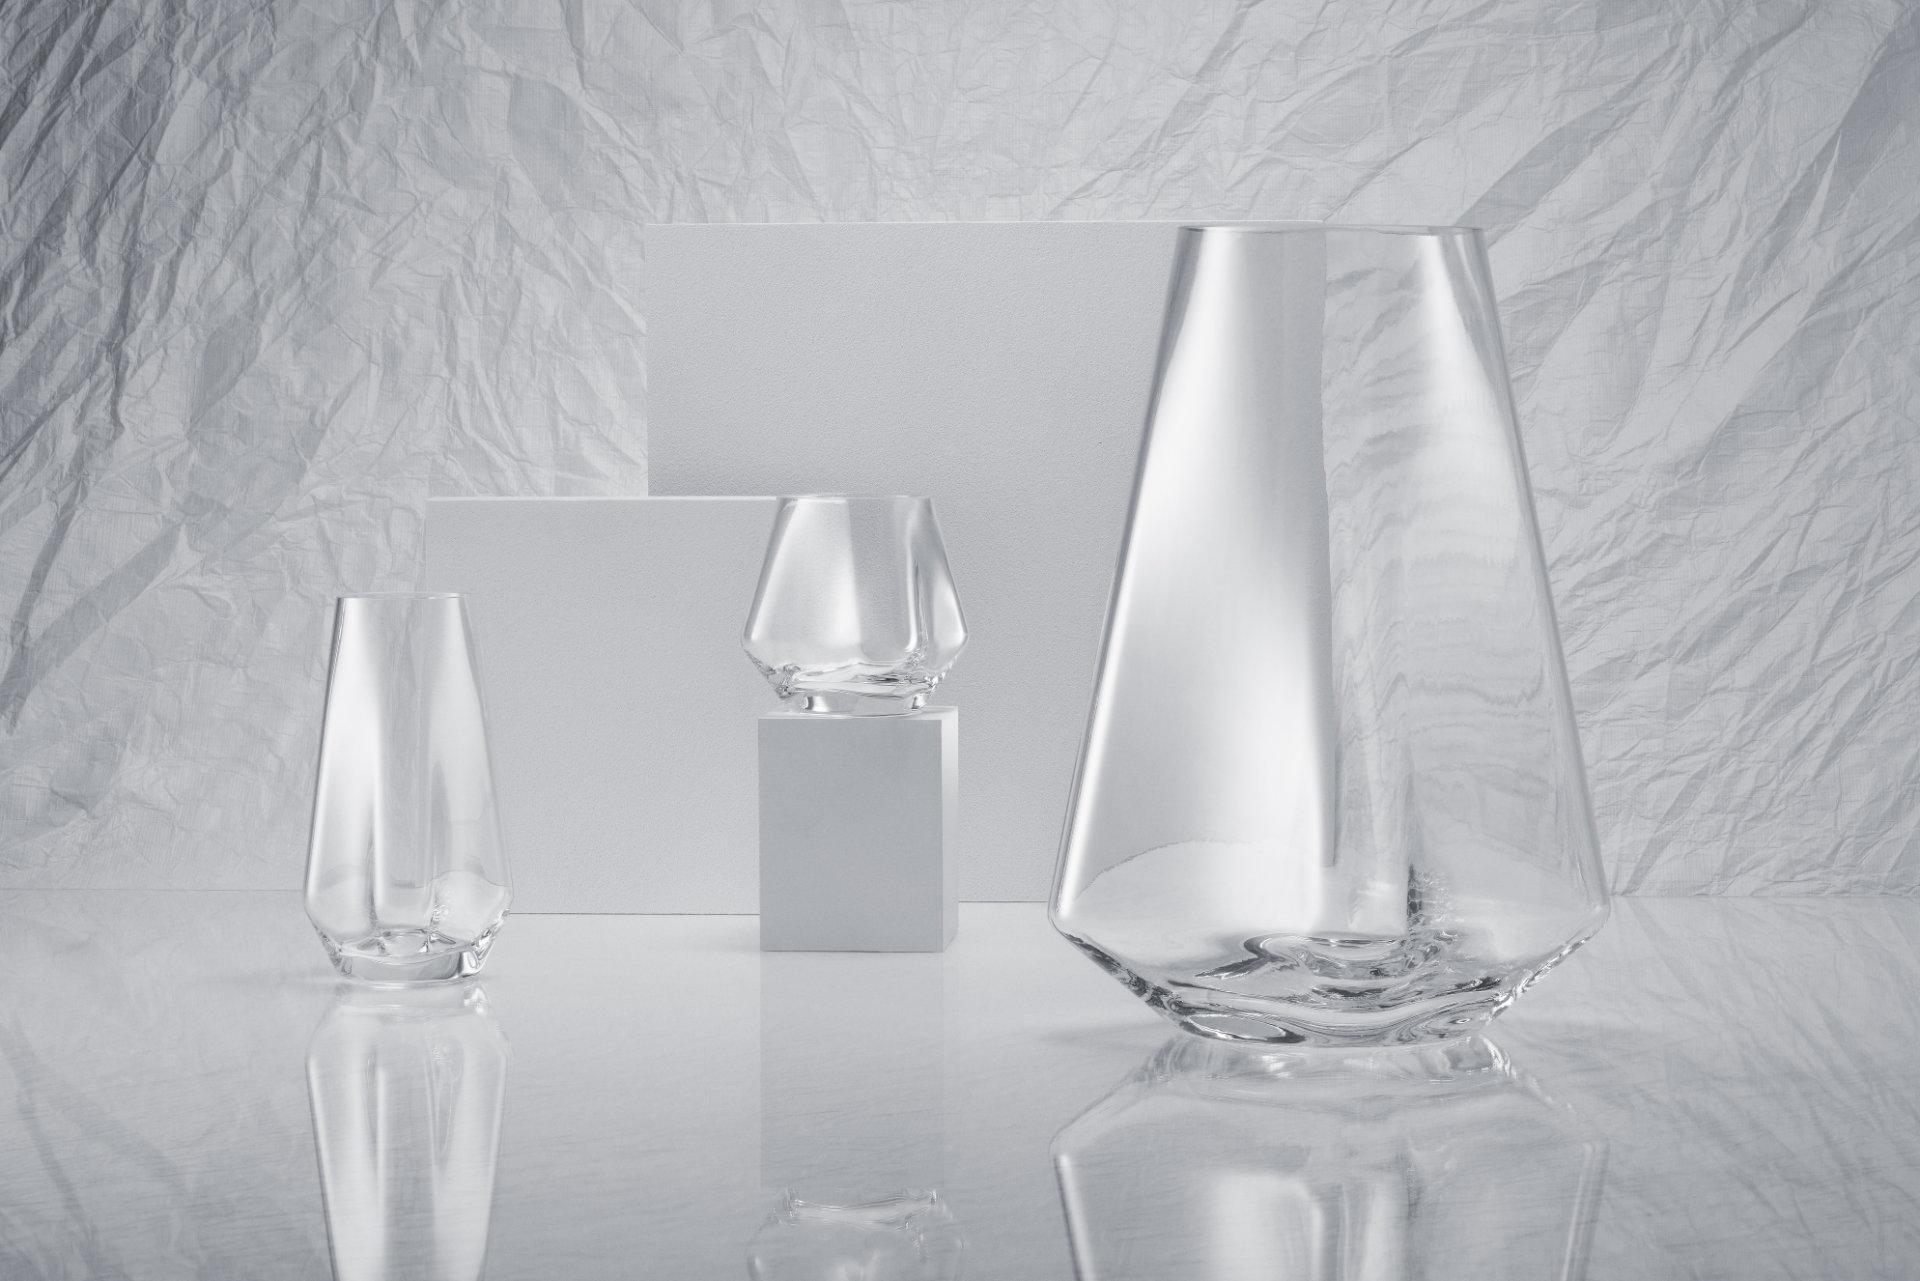 BrandDoctor | 2 choices: take a sip of LUCK or do you Primitivo? 2